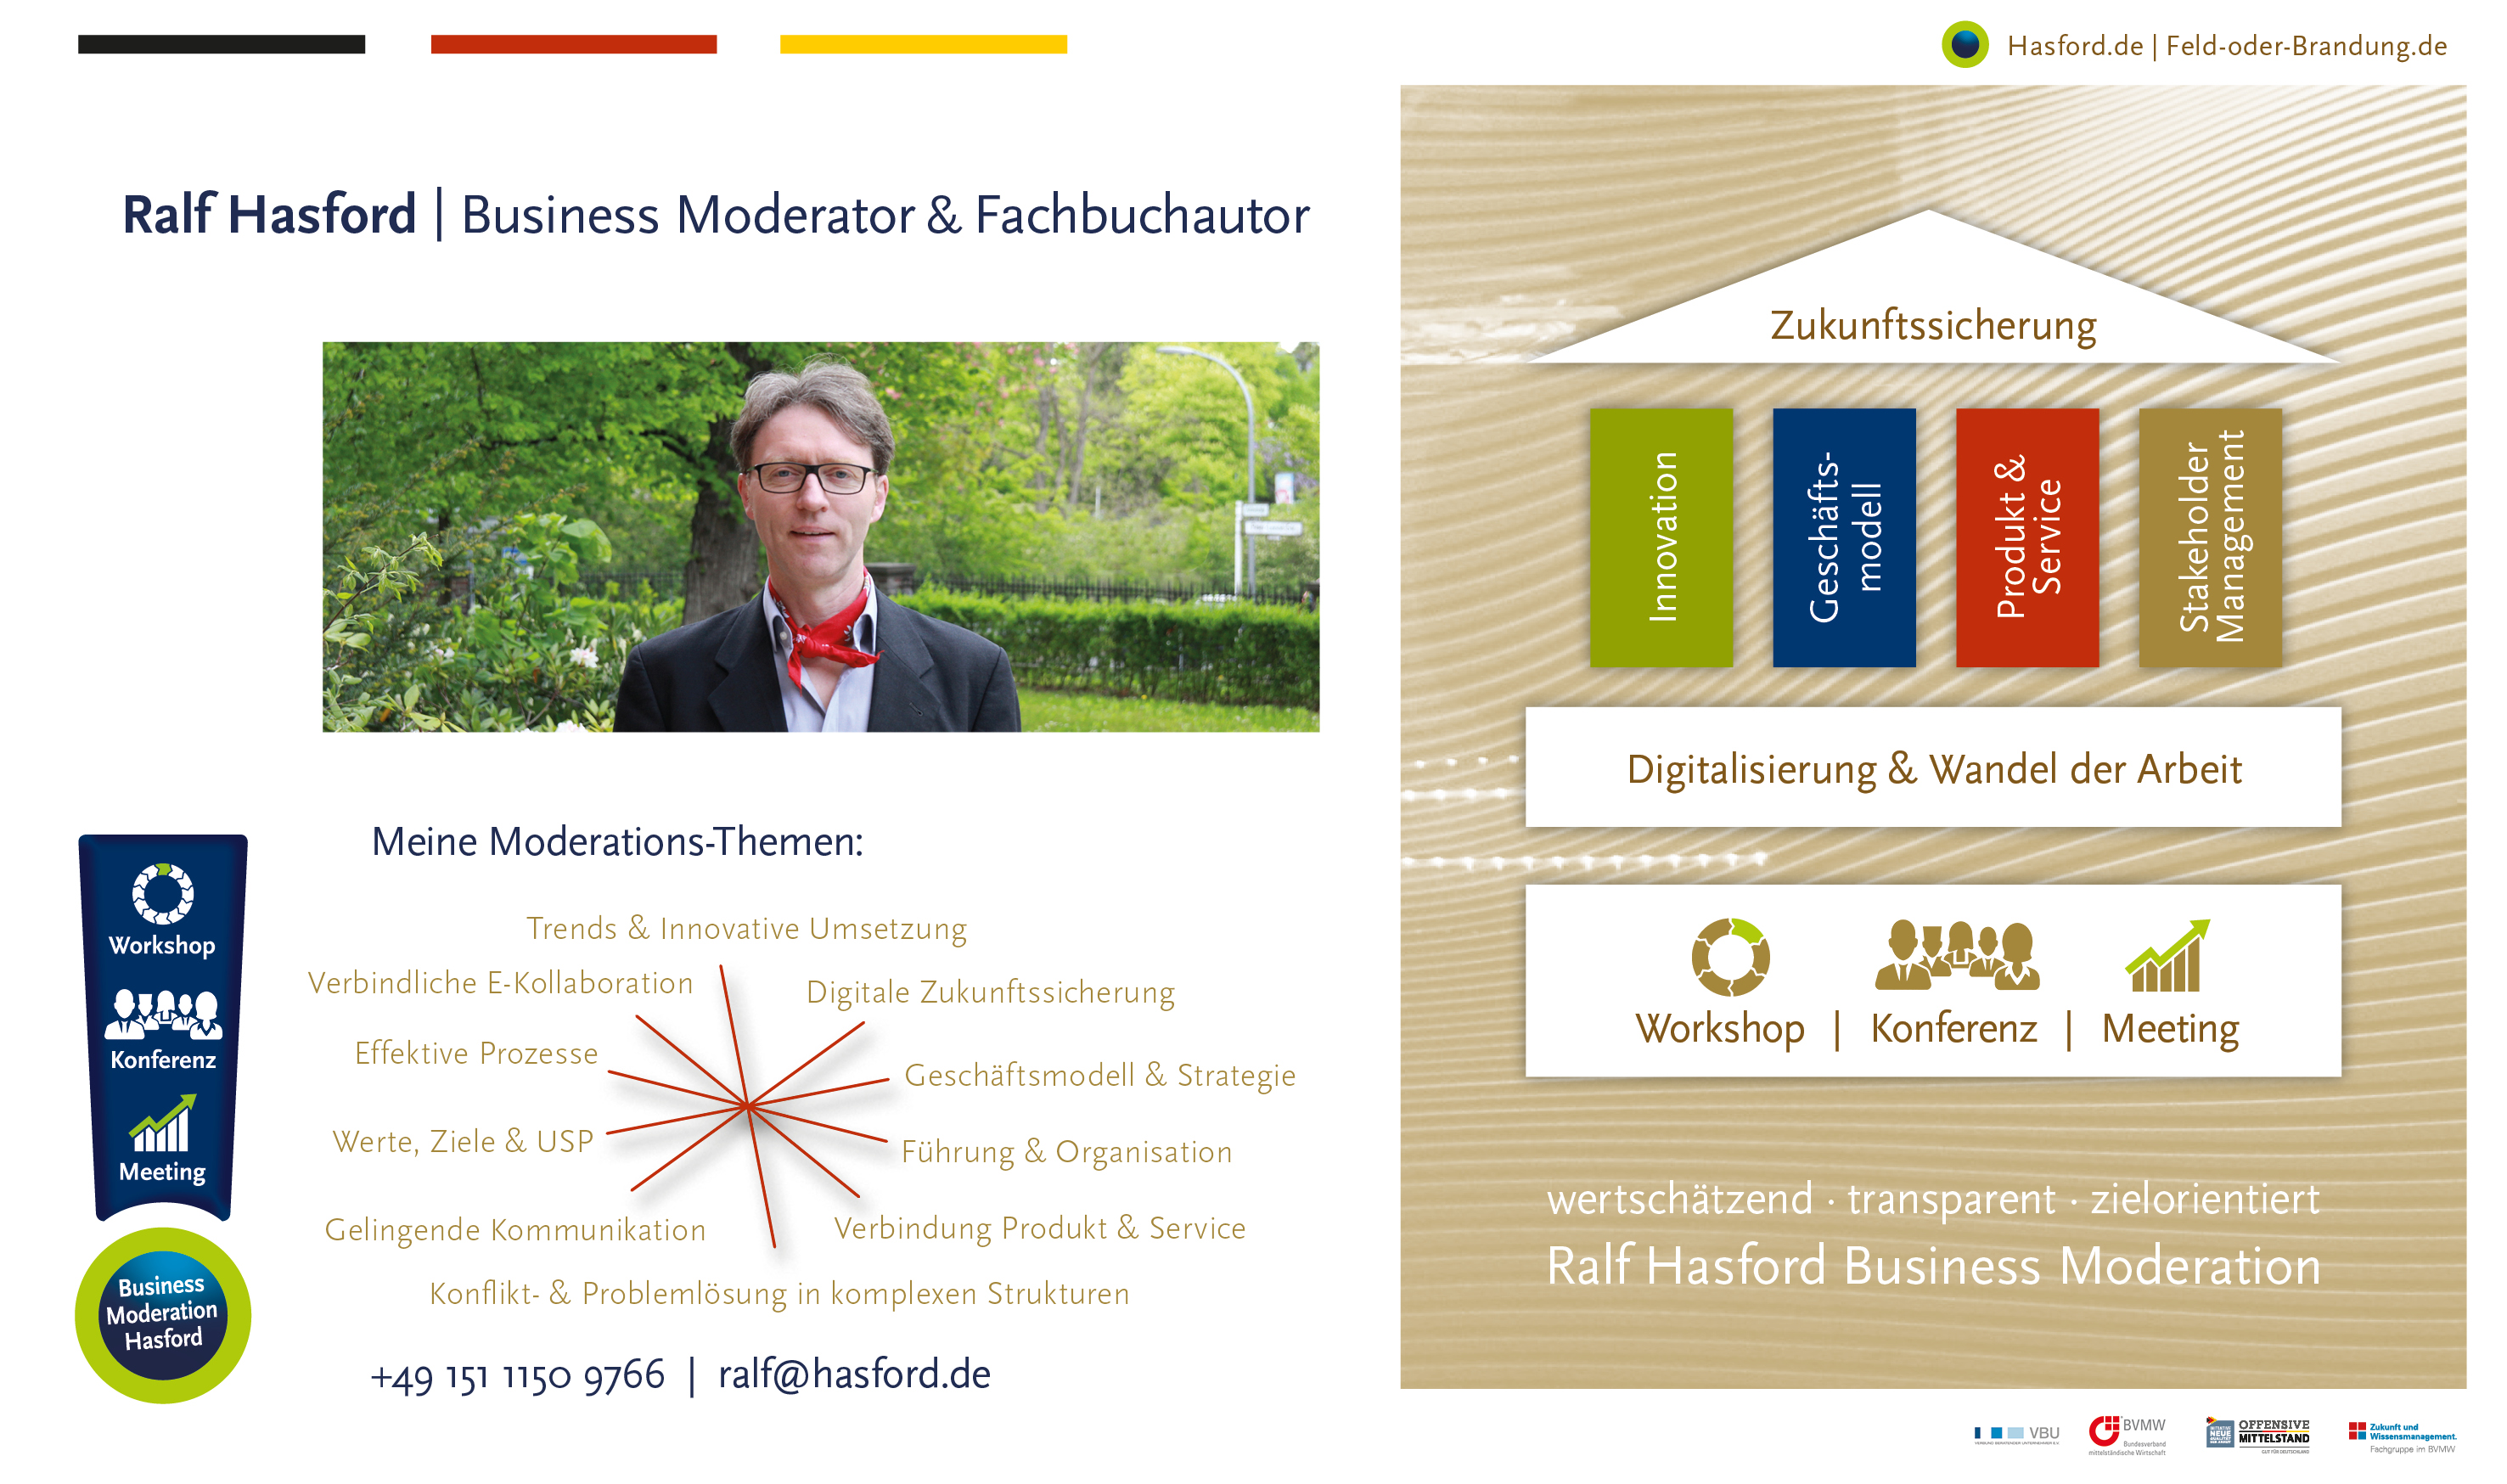 Ralf Hasford   Business Moderator & Fachbuchautor